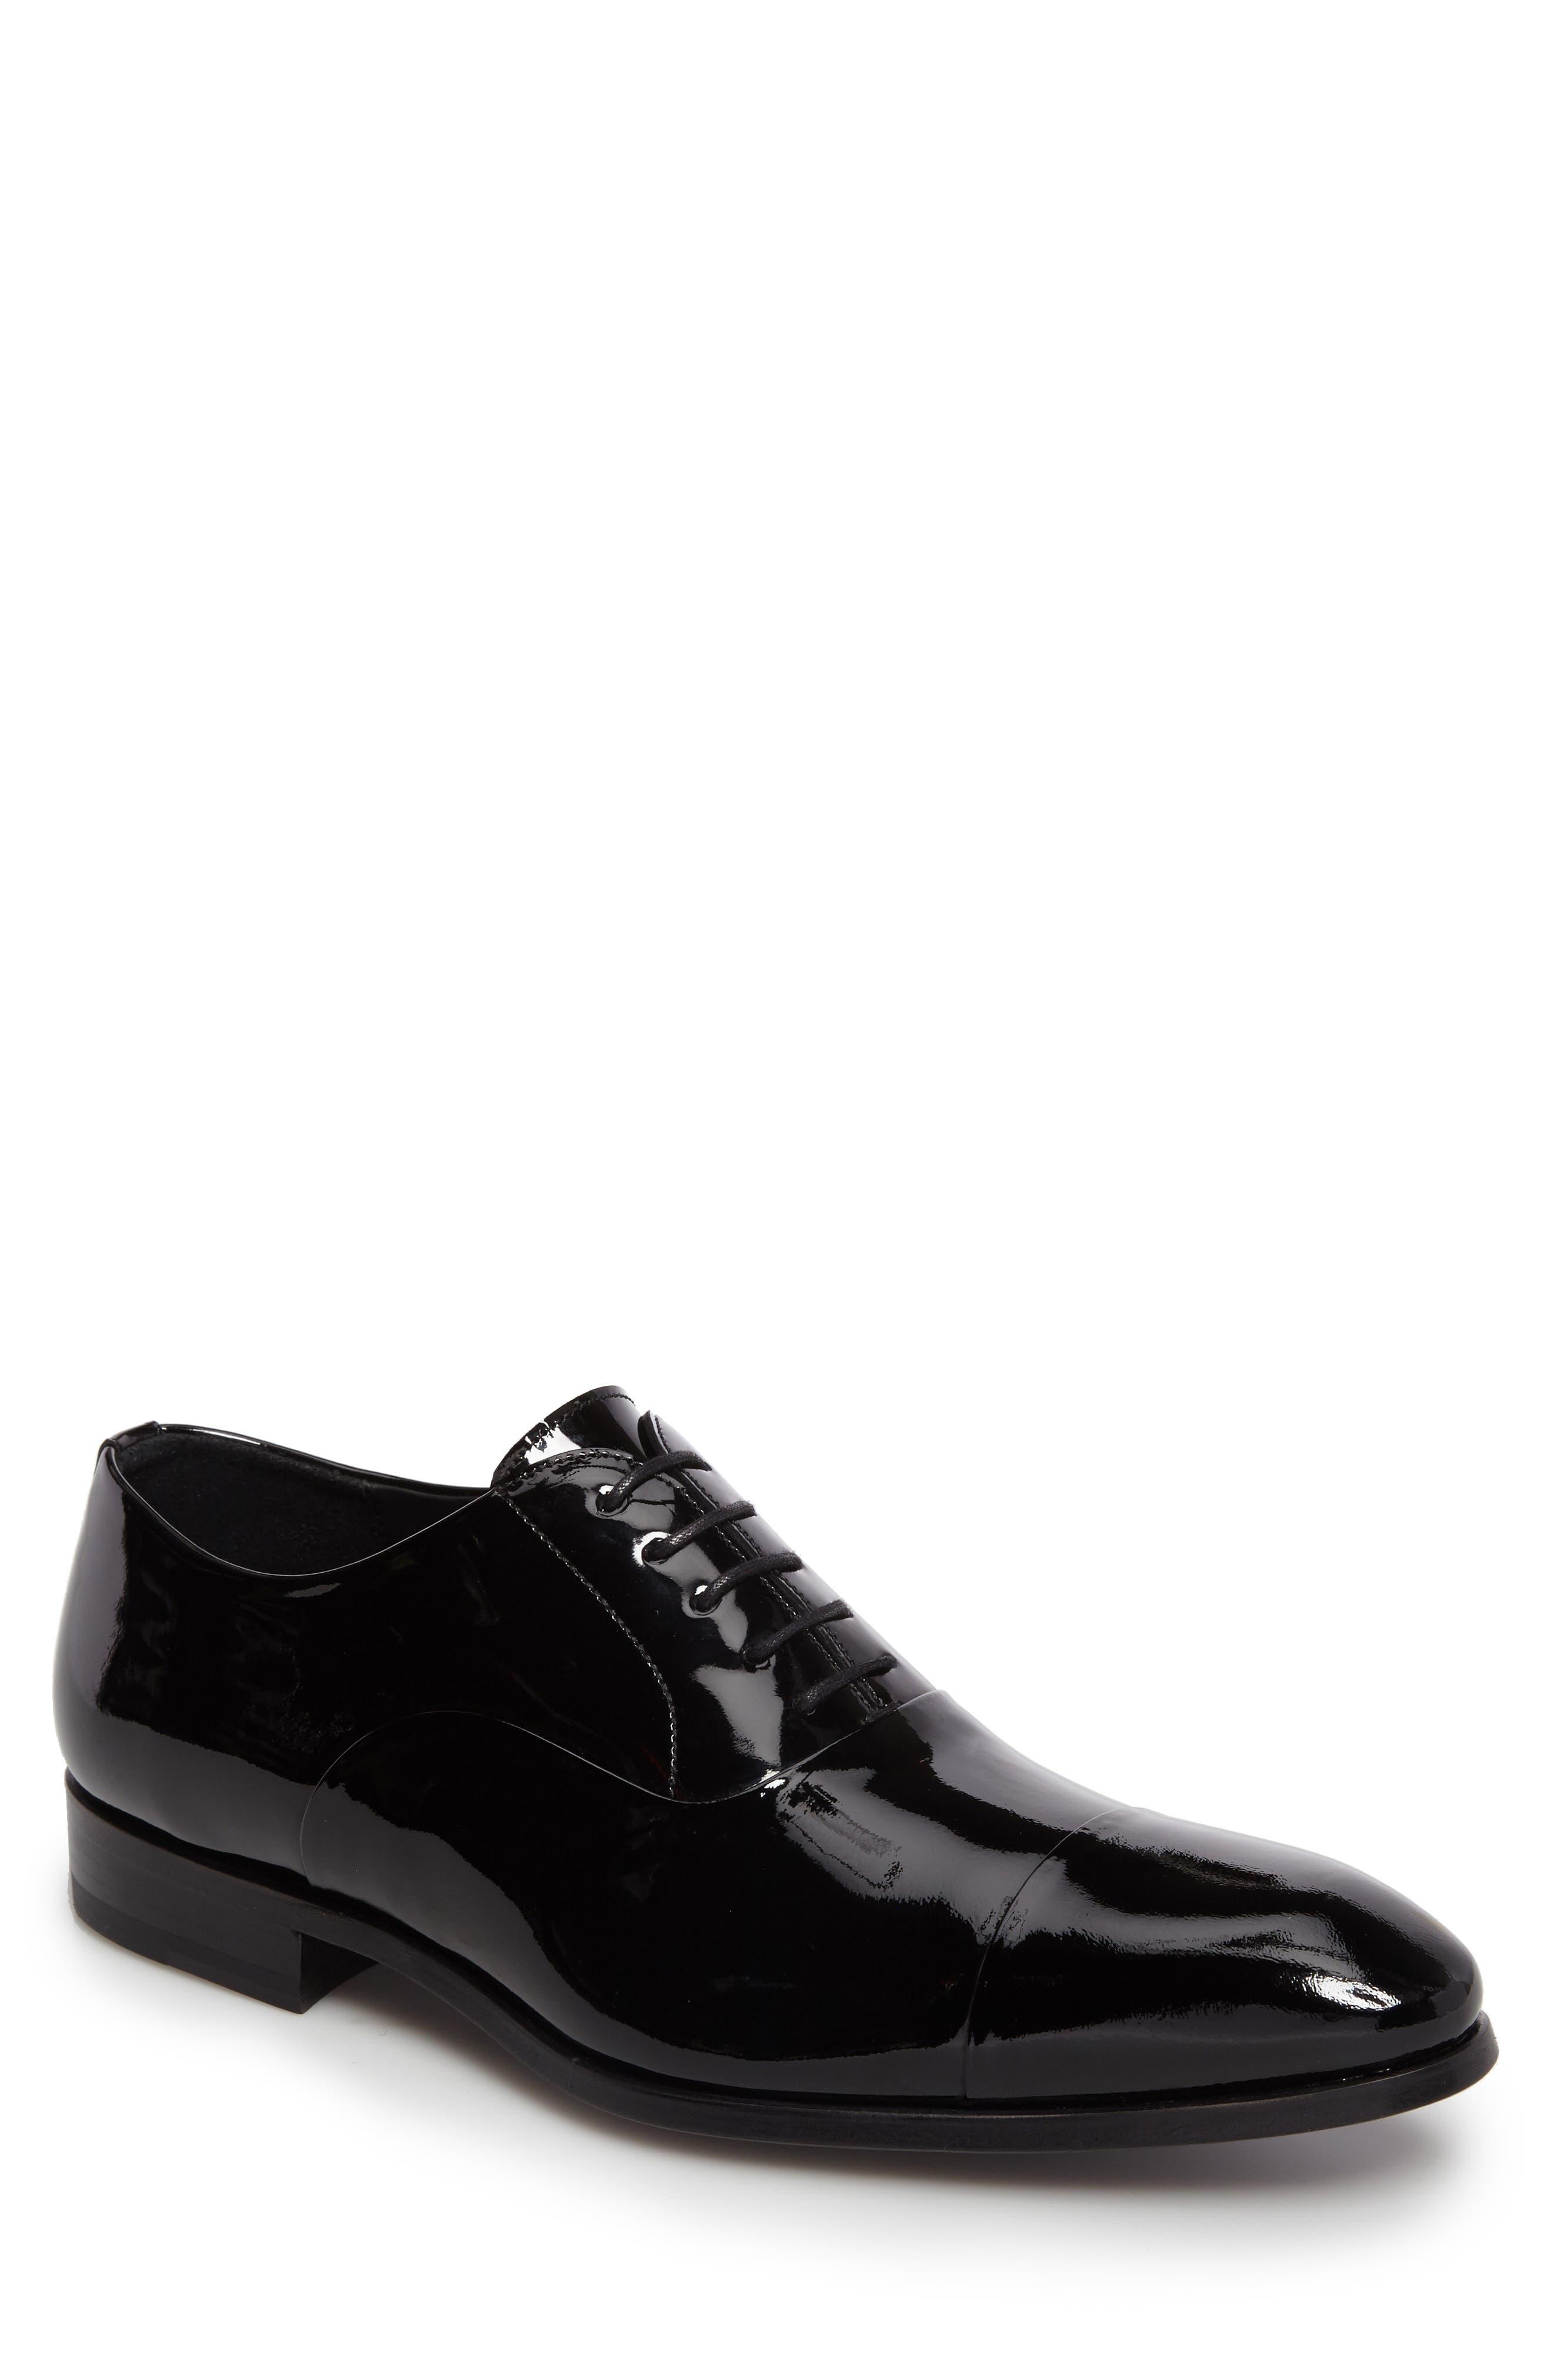 Davian Cap Toe Oxford,                         Main,                         color, Black Patent